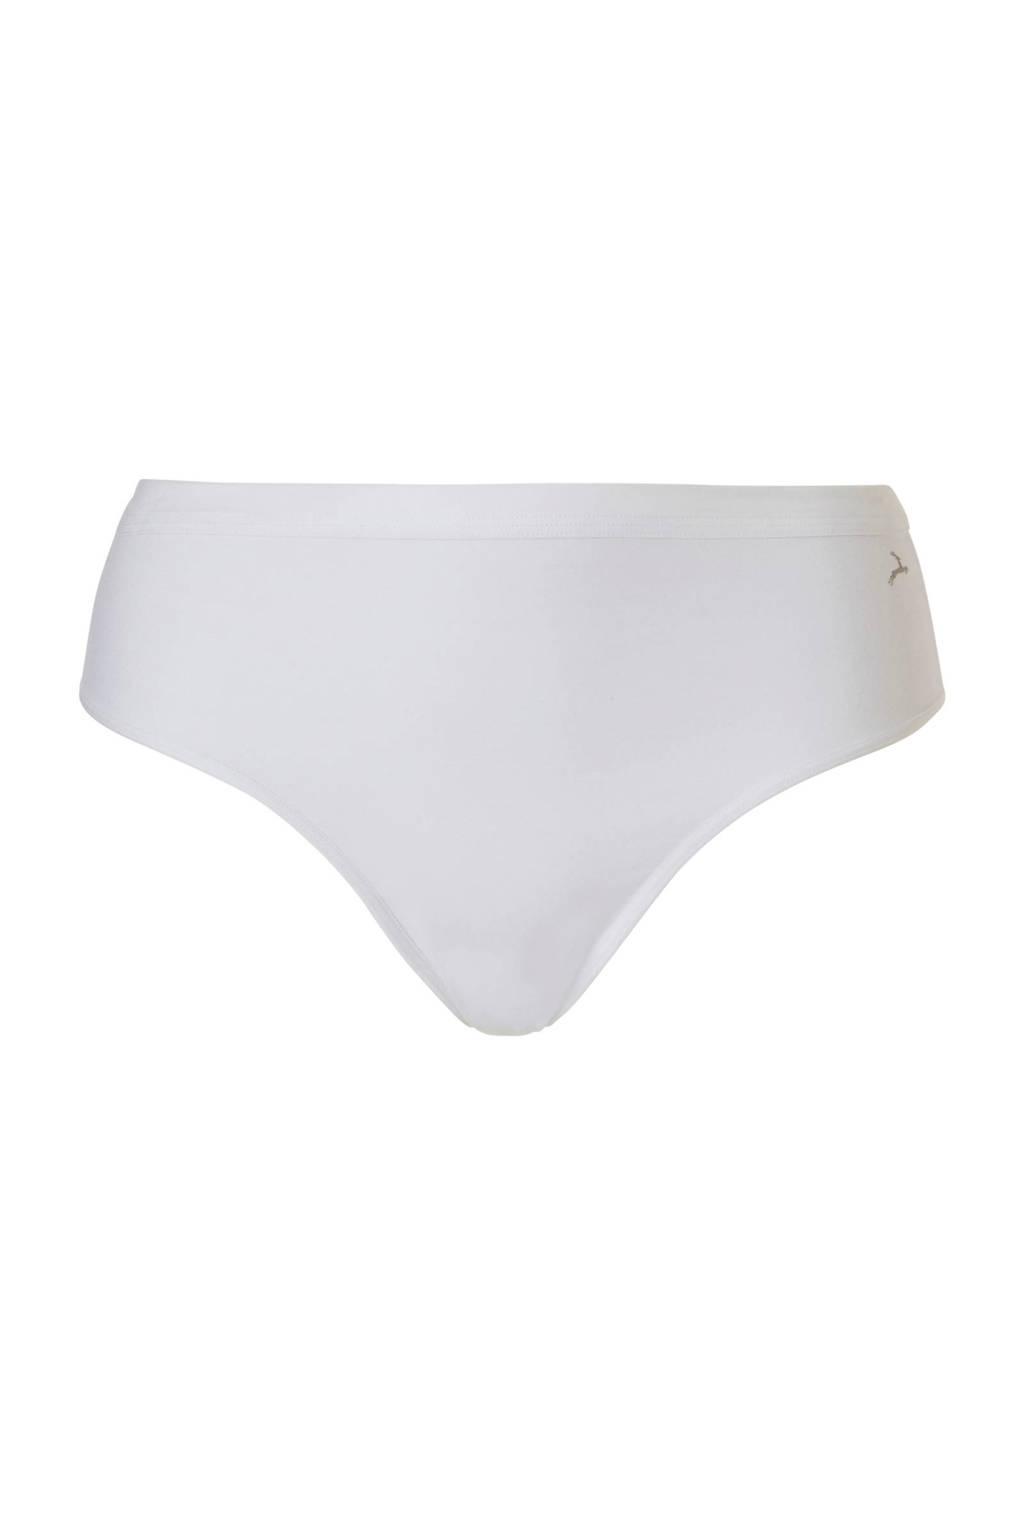 ten Cate Cotton Contour corrigerende string wit, Wit